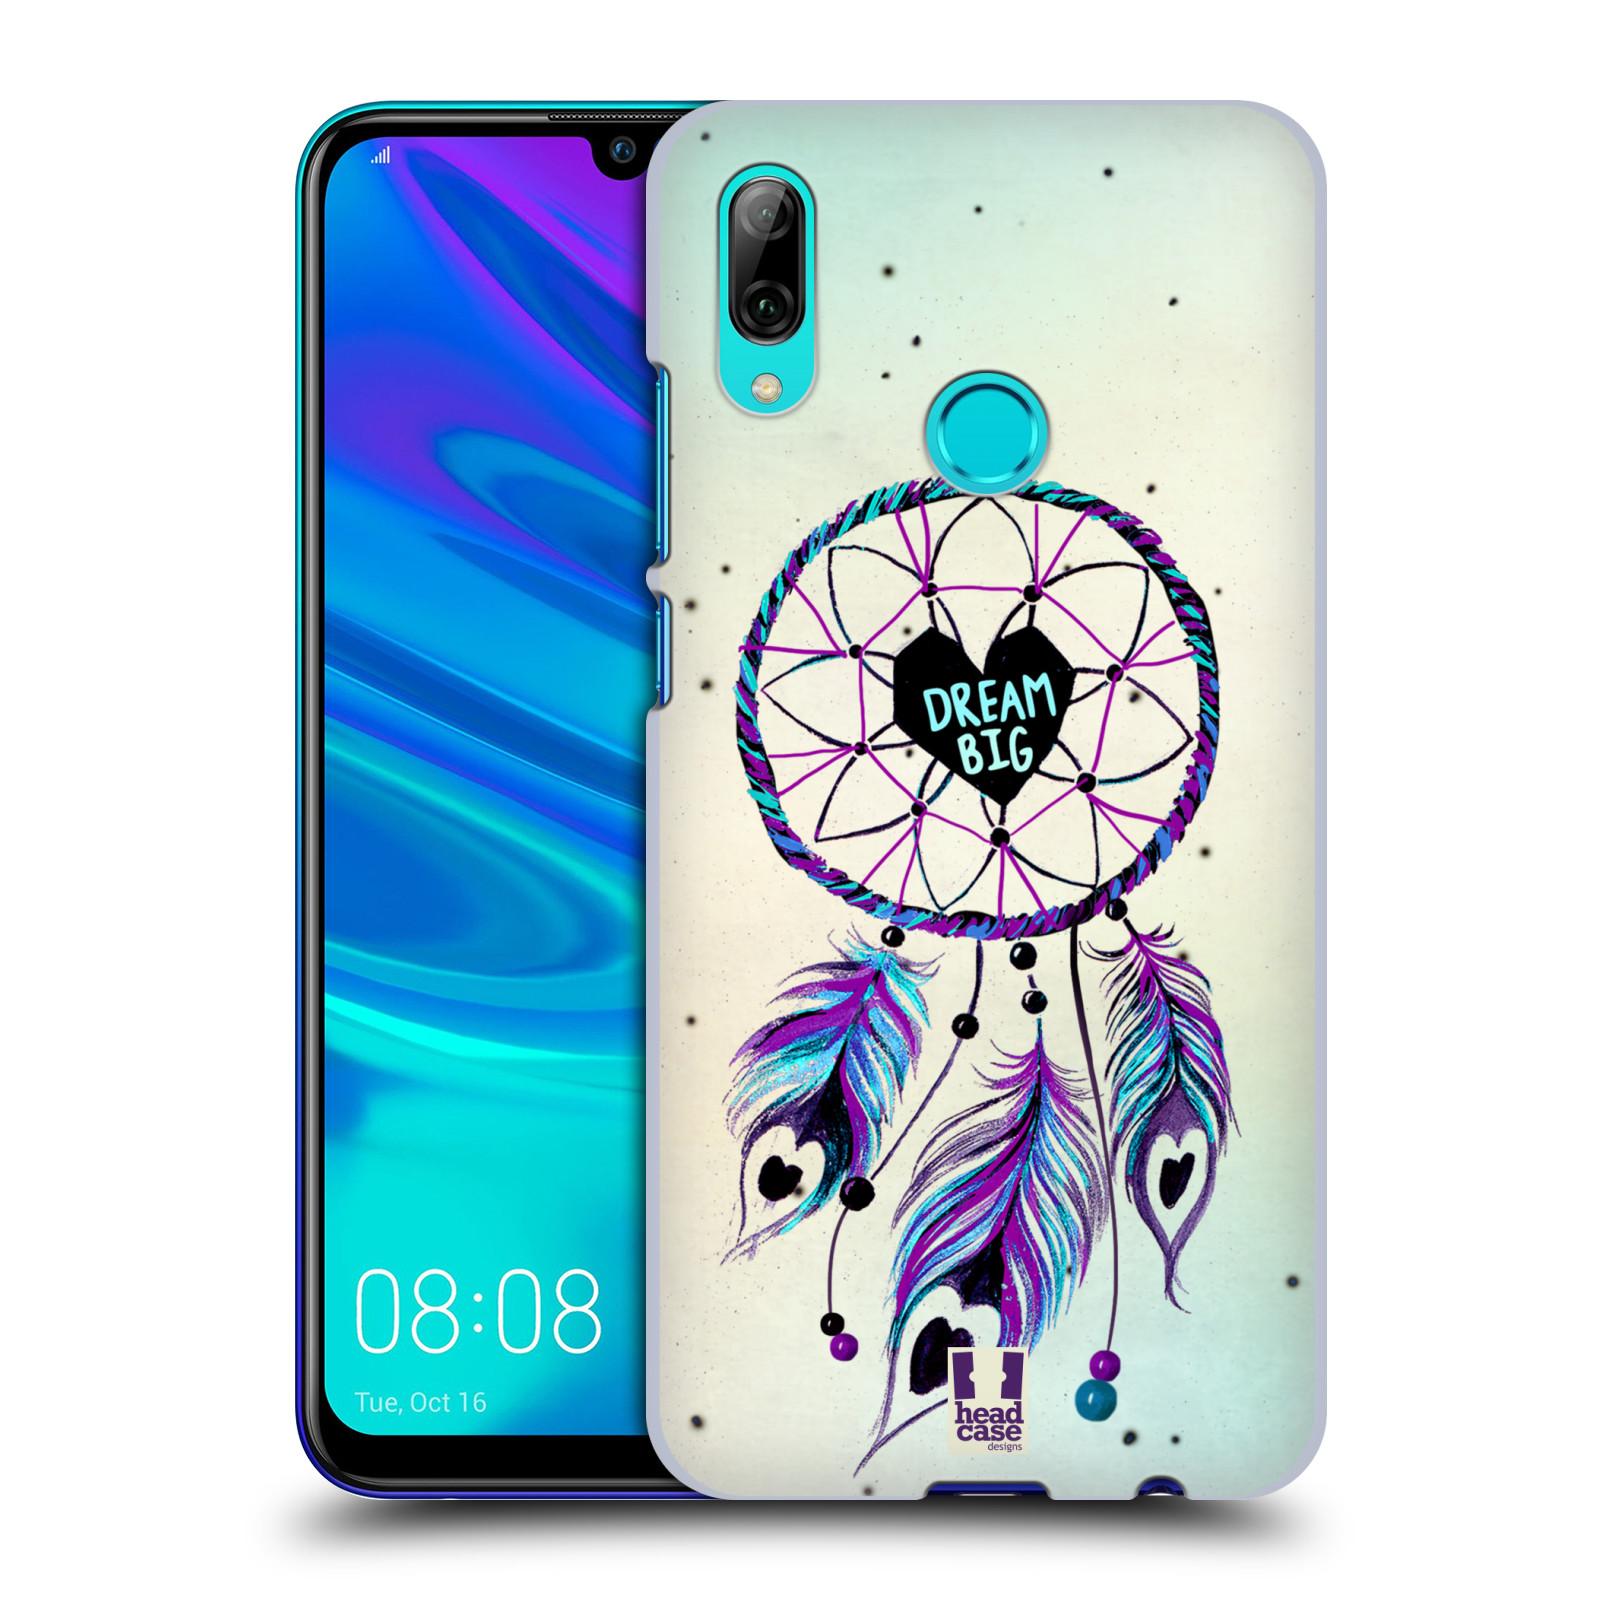 Plastové pouzdro na mobil Huawei P Smart (2019) - Head Case - Lapač Assorted Dream Big Srdce